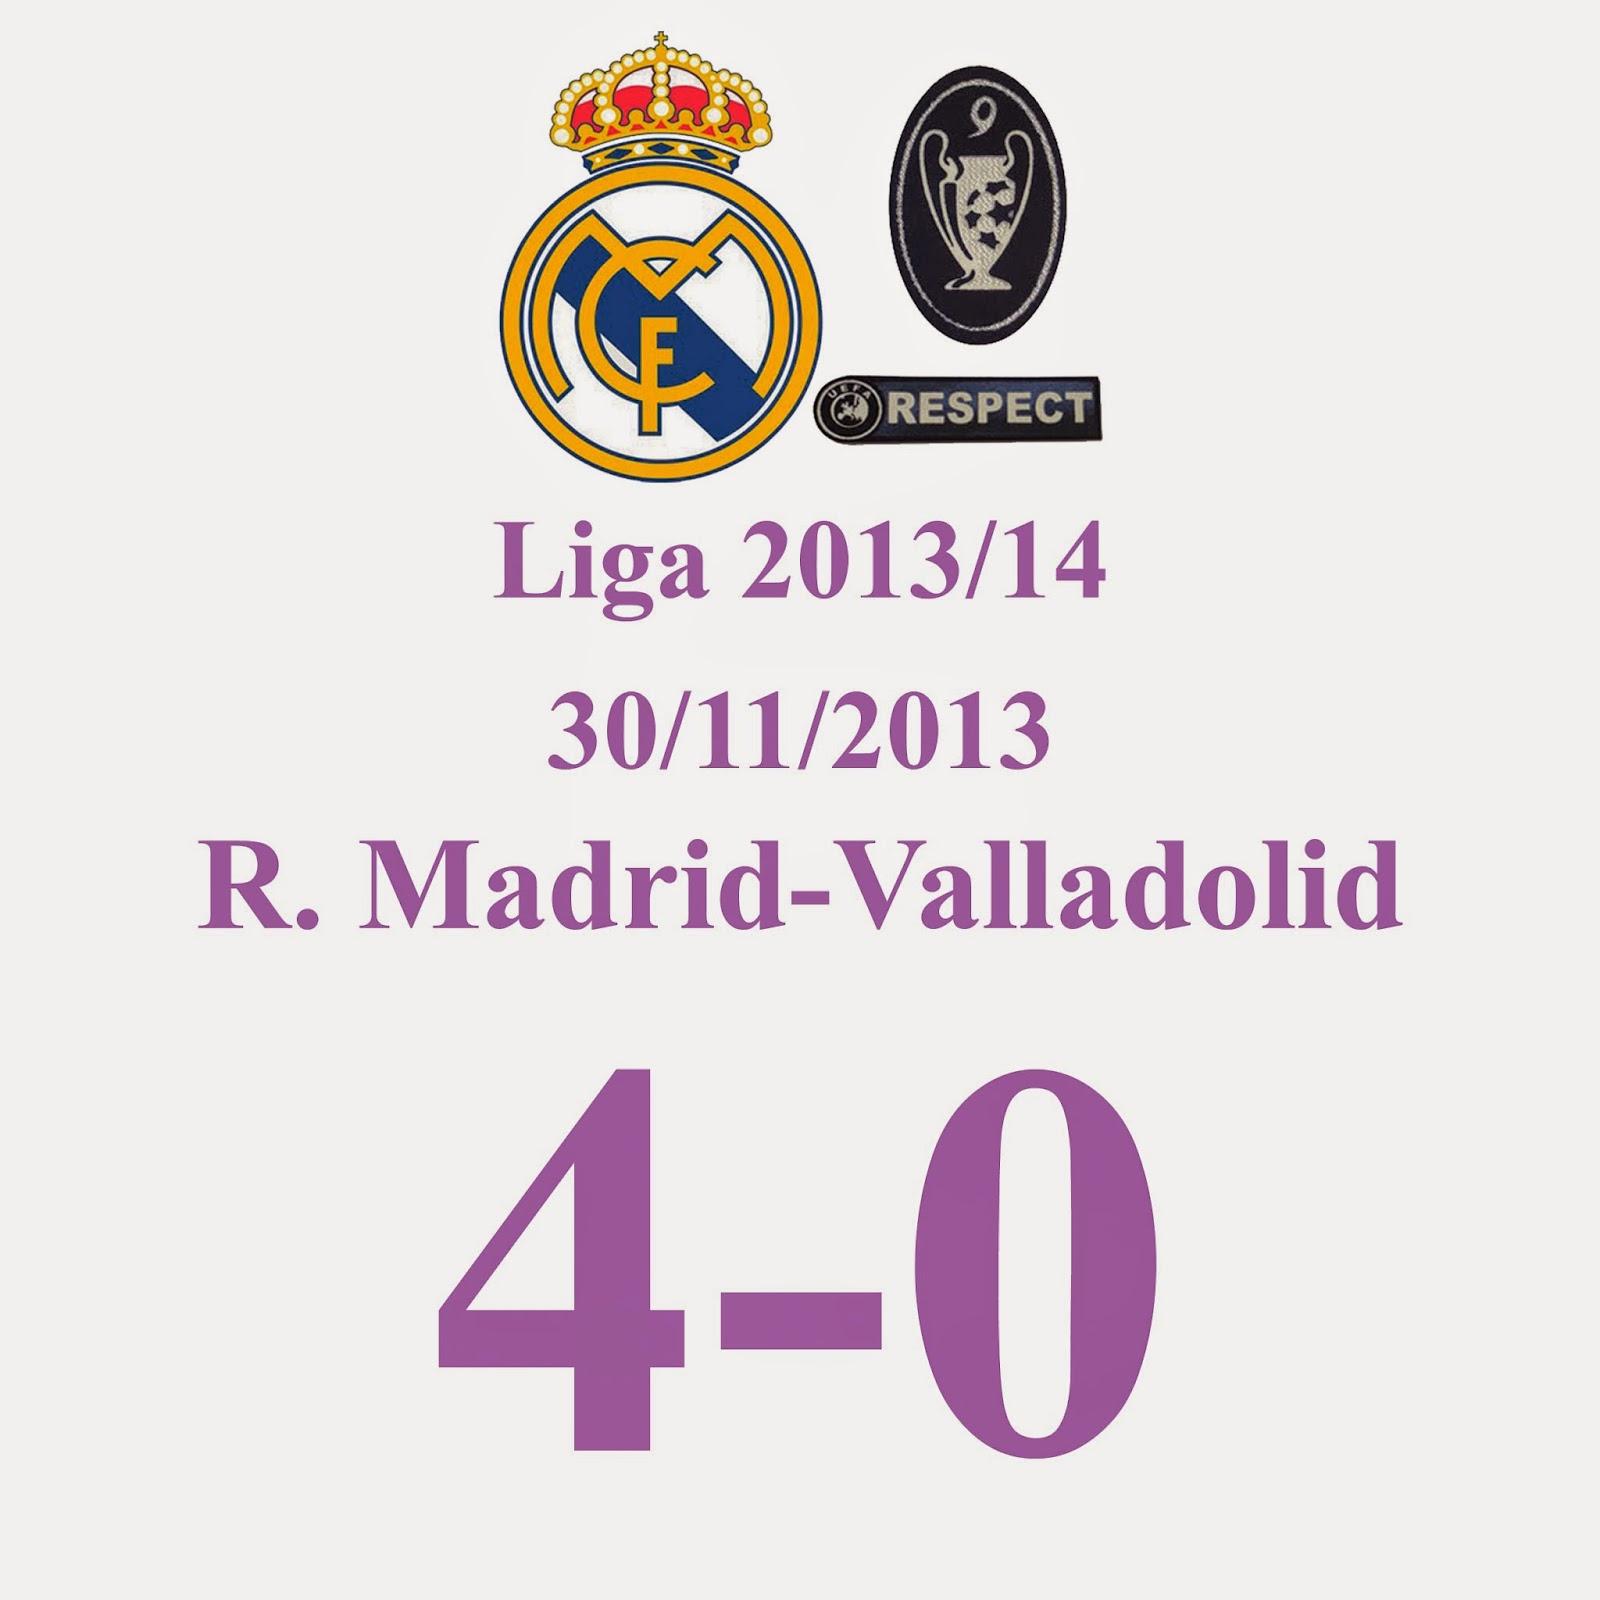 Real Madrid 4 - 0 Real Valladolid (Jornada 15) 30/11/2013 Hat-Trick de Gareth Bale